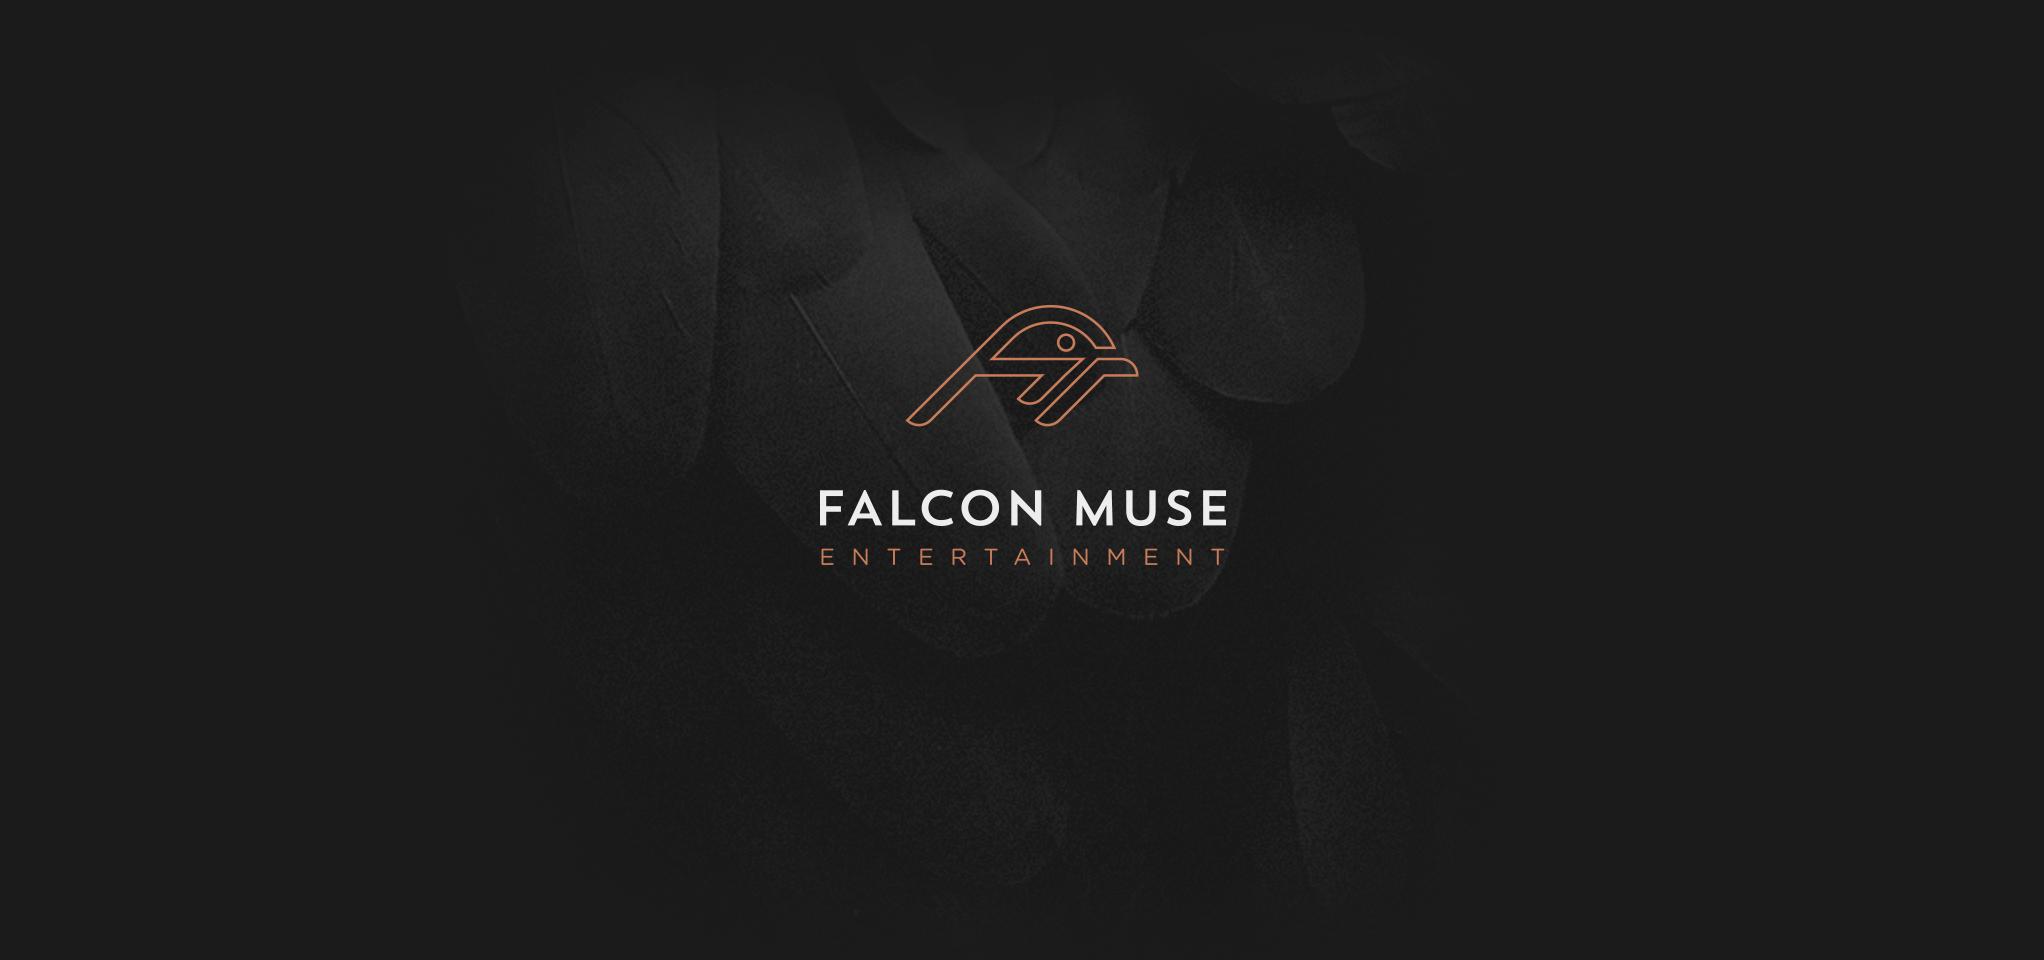 falconmuse01